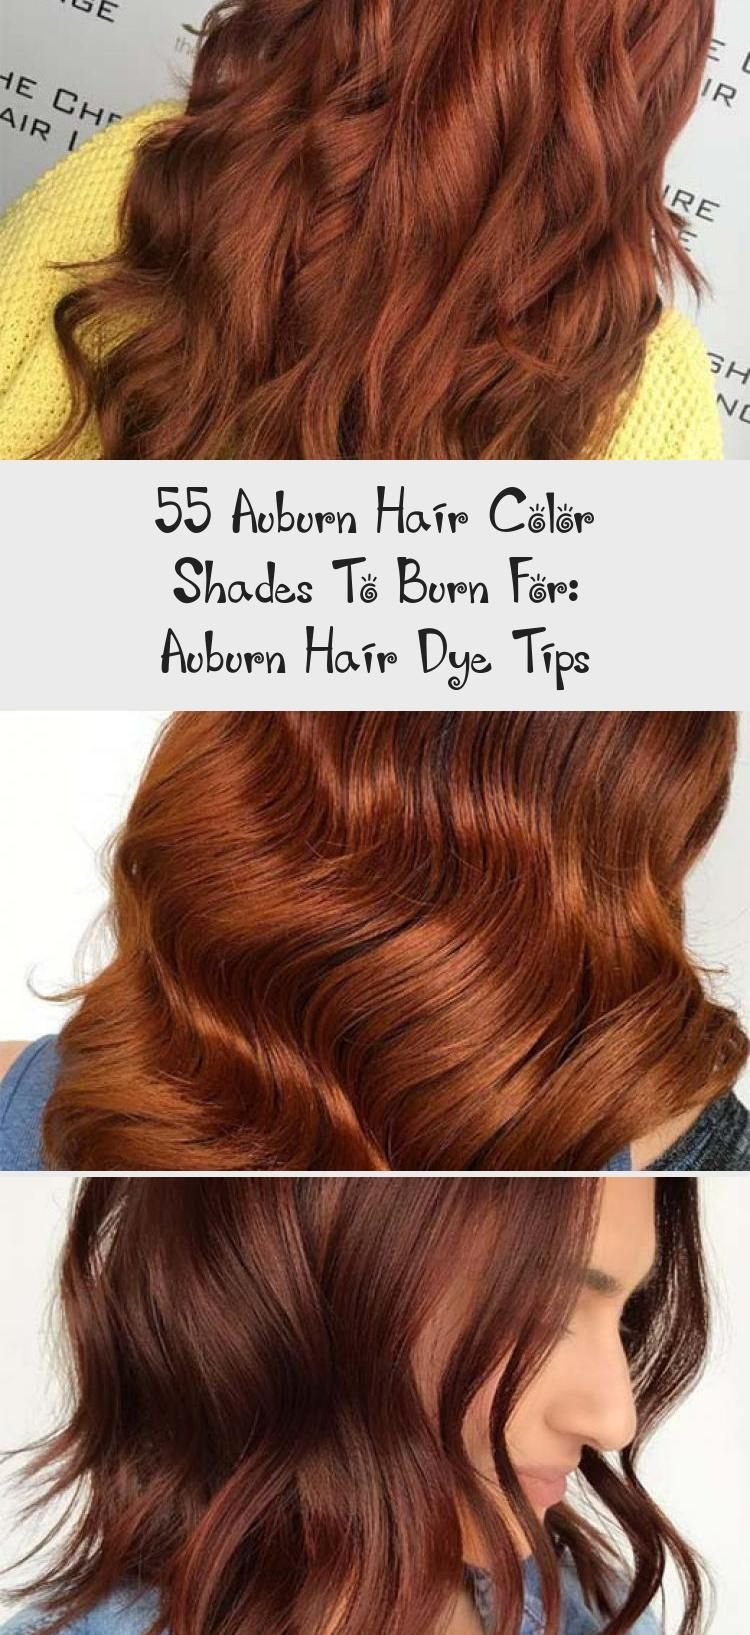 55 Auburn Hair Shades To Burn Auburn Hair Dye Tips Best Hairstyles Aub Aub Auburn Burn Dye Hair Hairsty Auburn Hair Dye Hair Dye Tips Auburn Hair